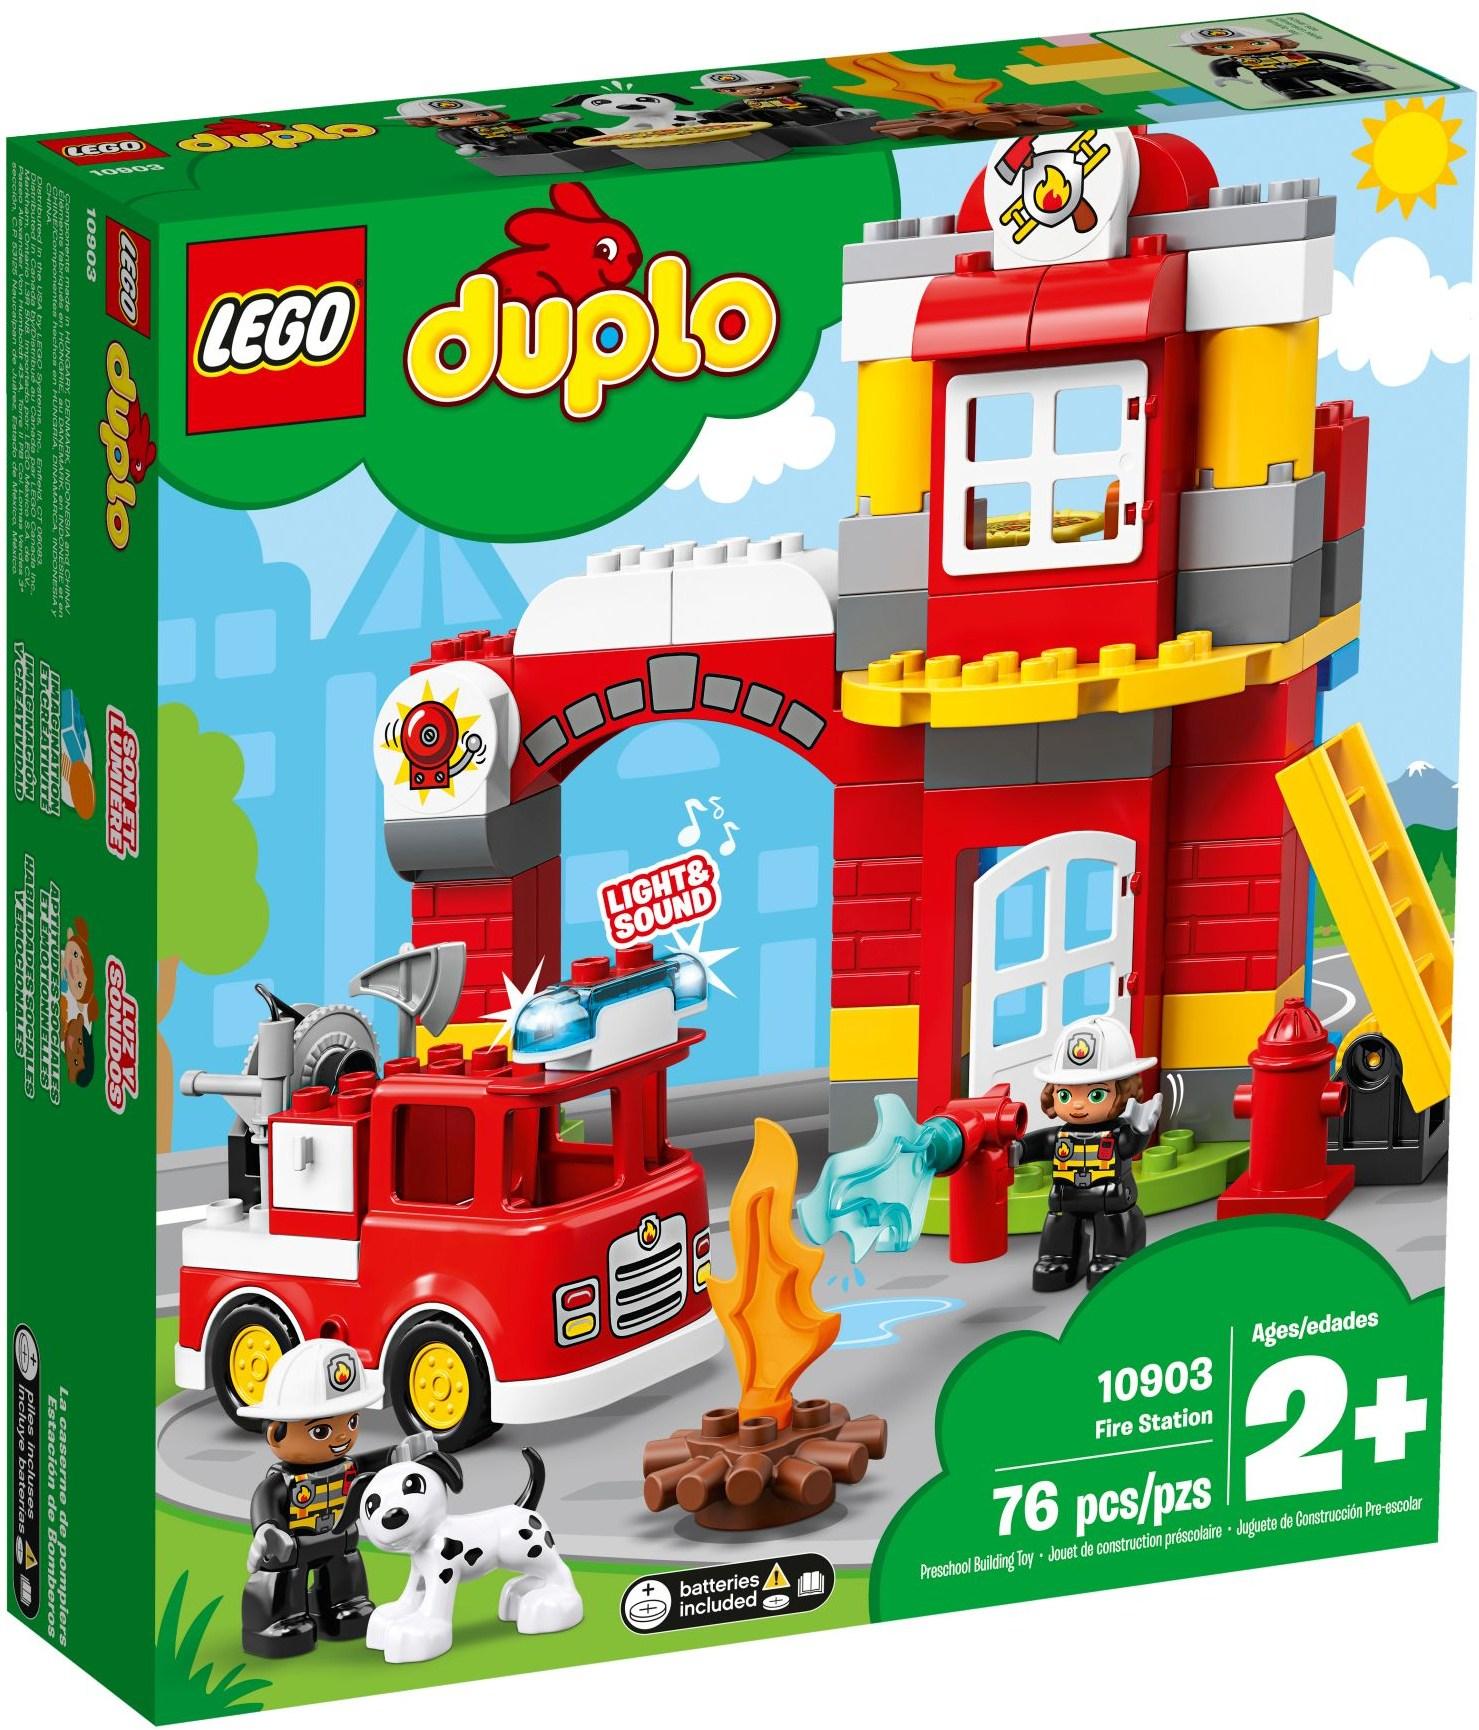 LEGO Fire Station - 10903